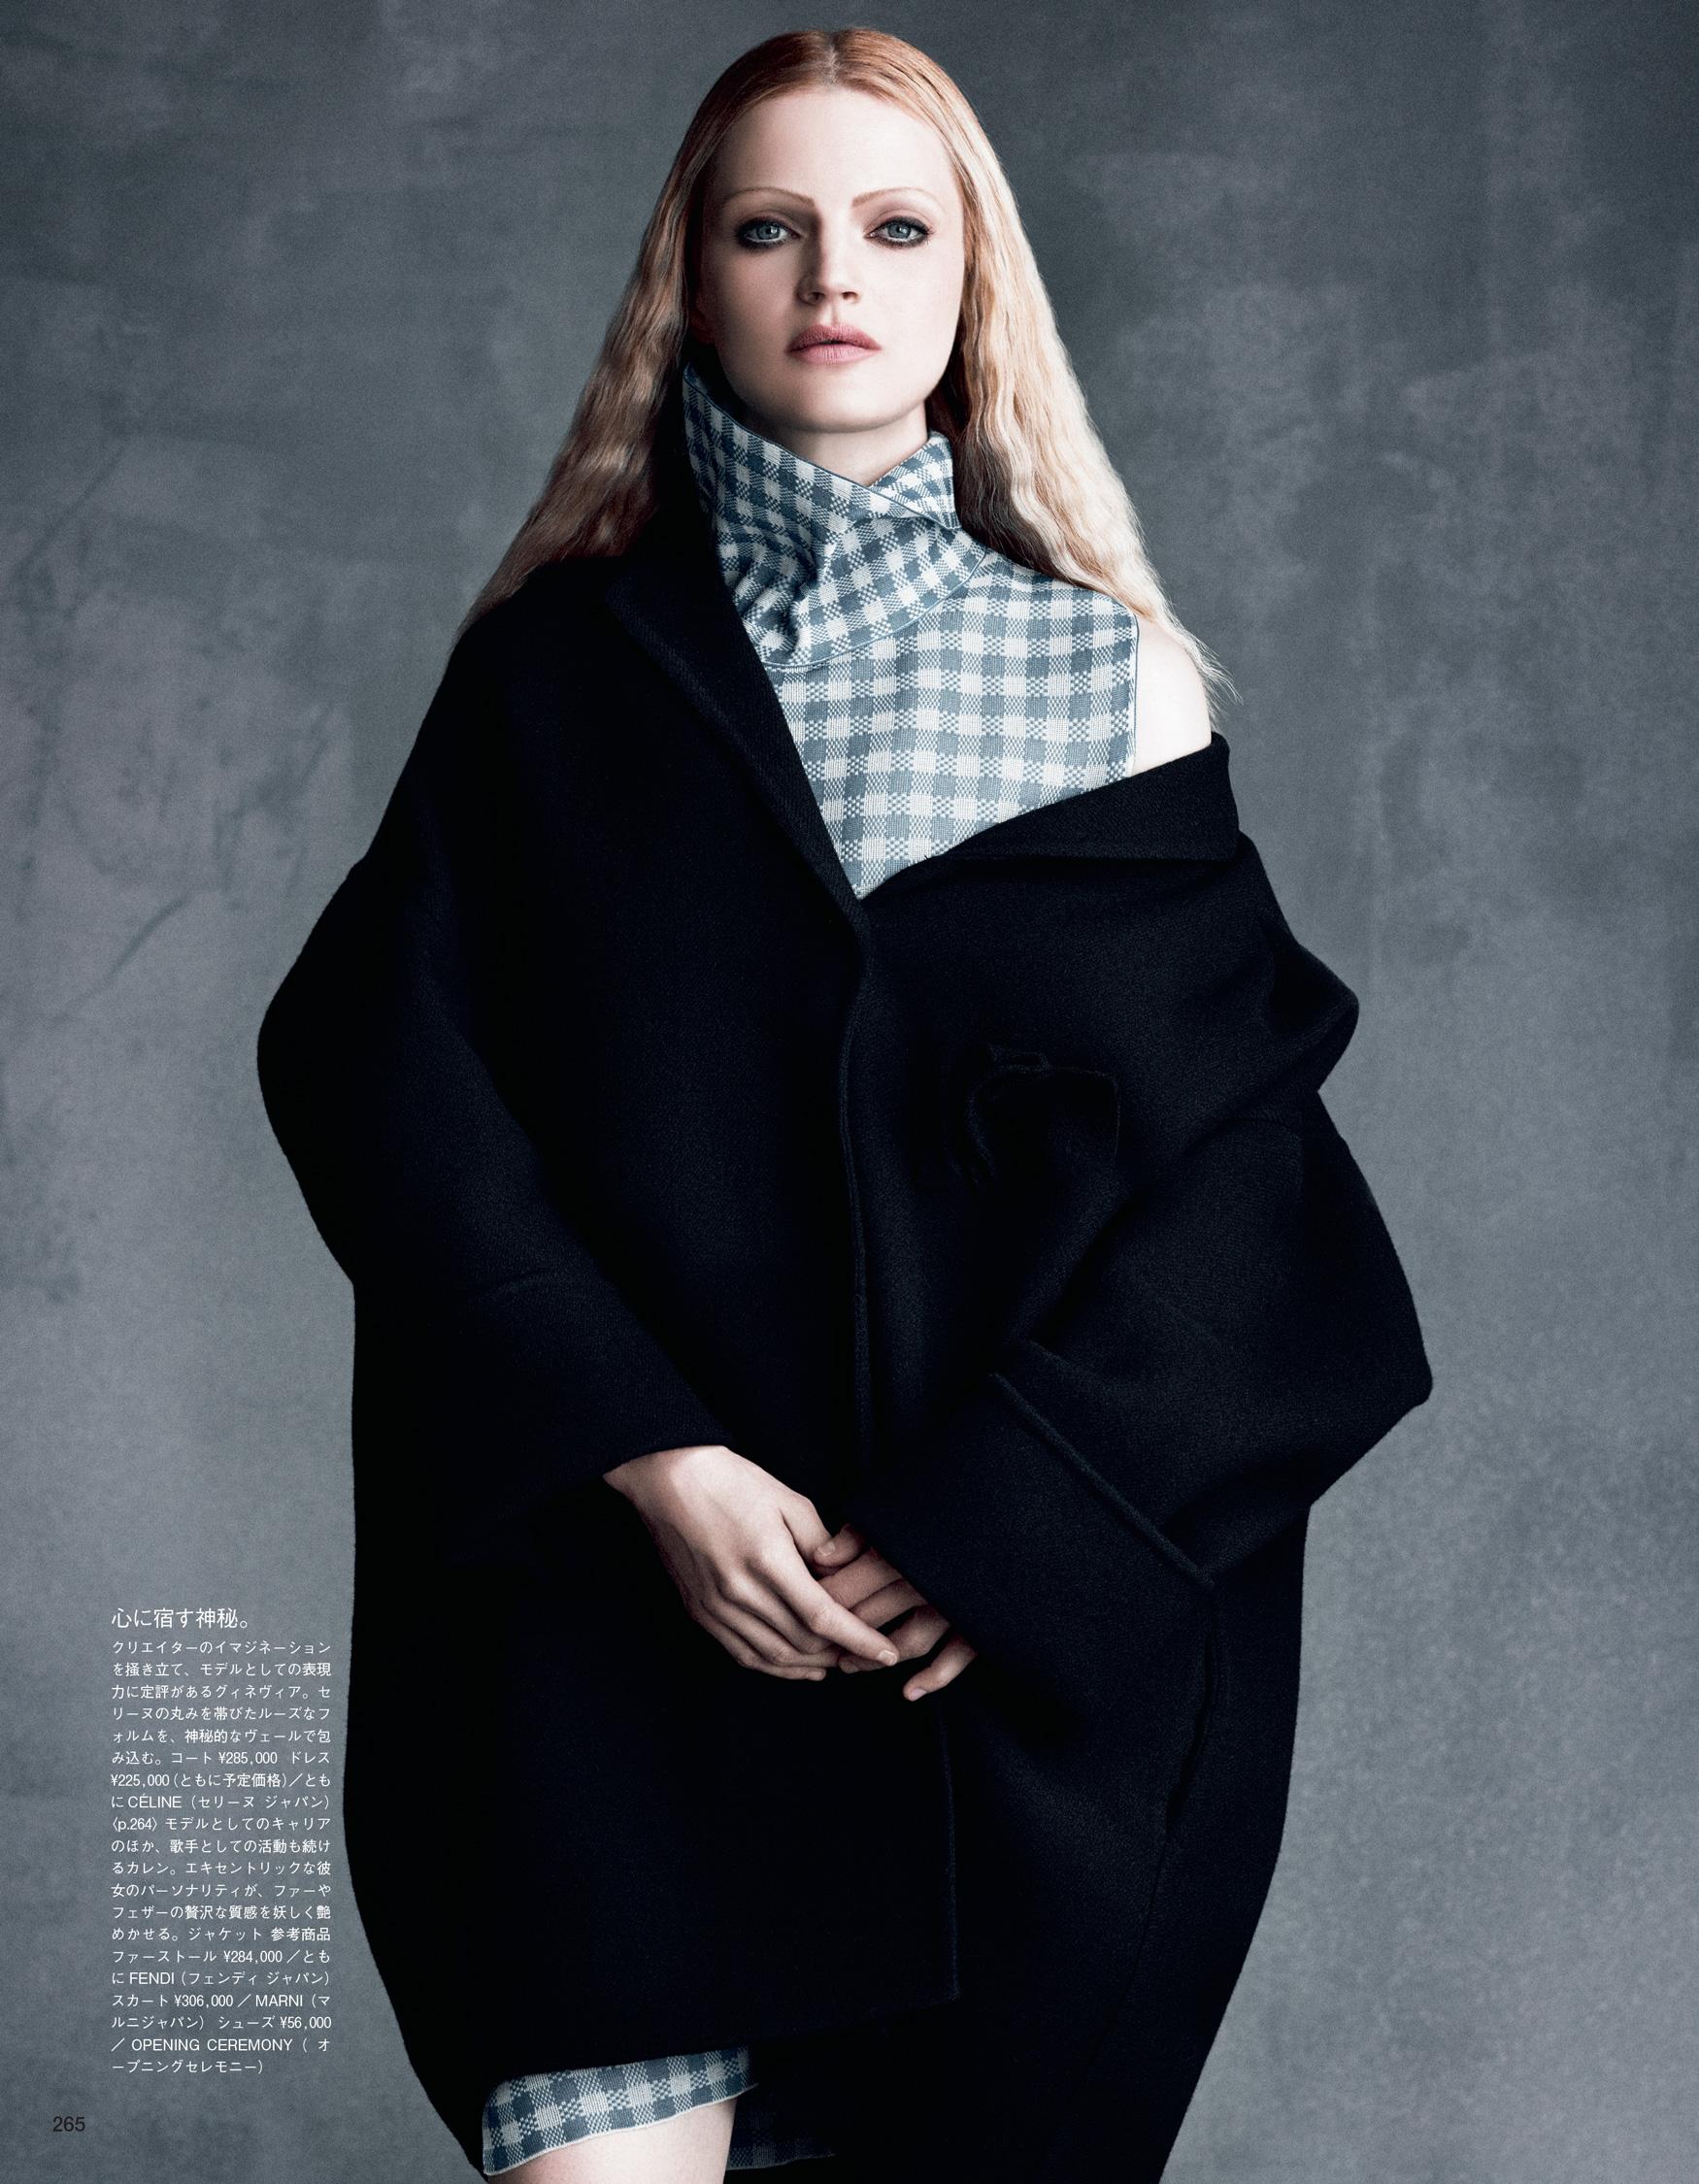 Giovanna-Battaglia-The-Icons-Of-Perfections-Vogue-Japan-15th-Anniversary-Issue-Luigi-Iango-V181_265_200-3.jpg